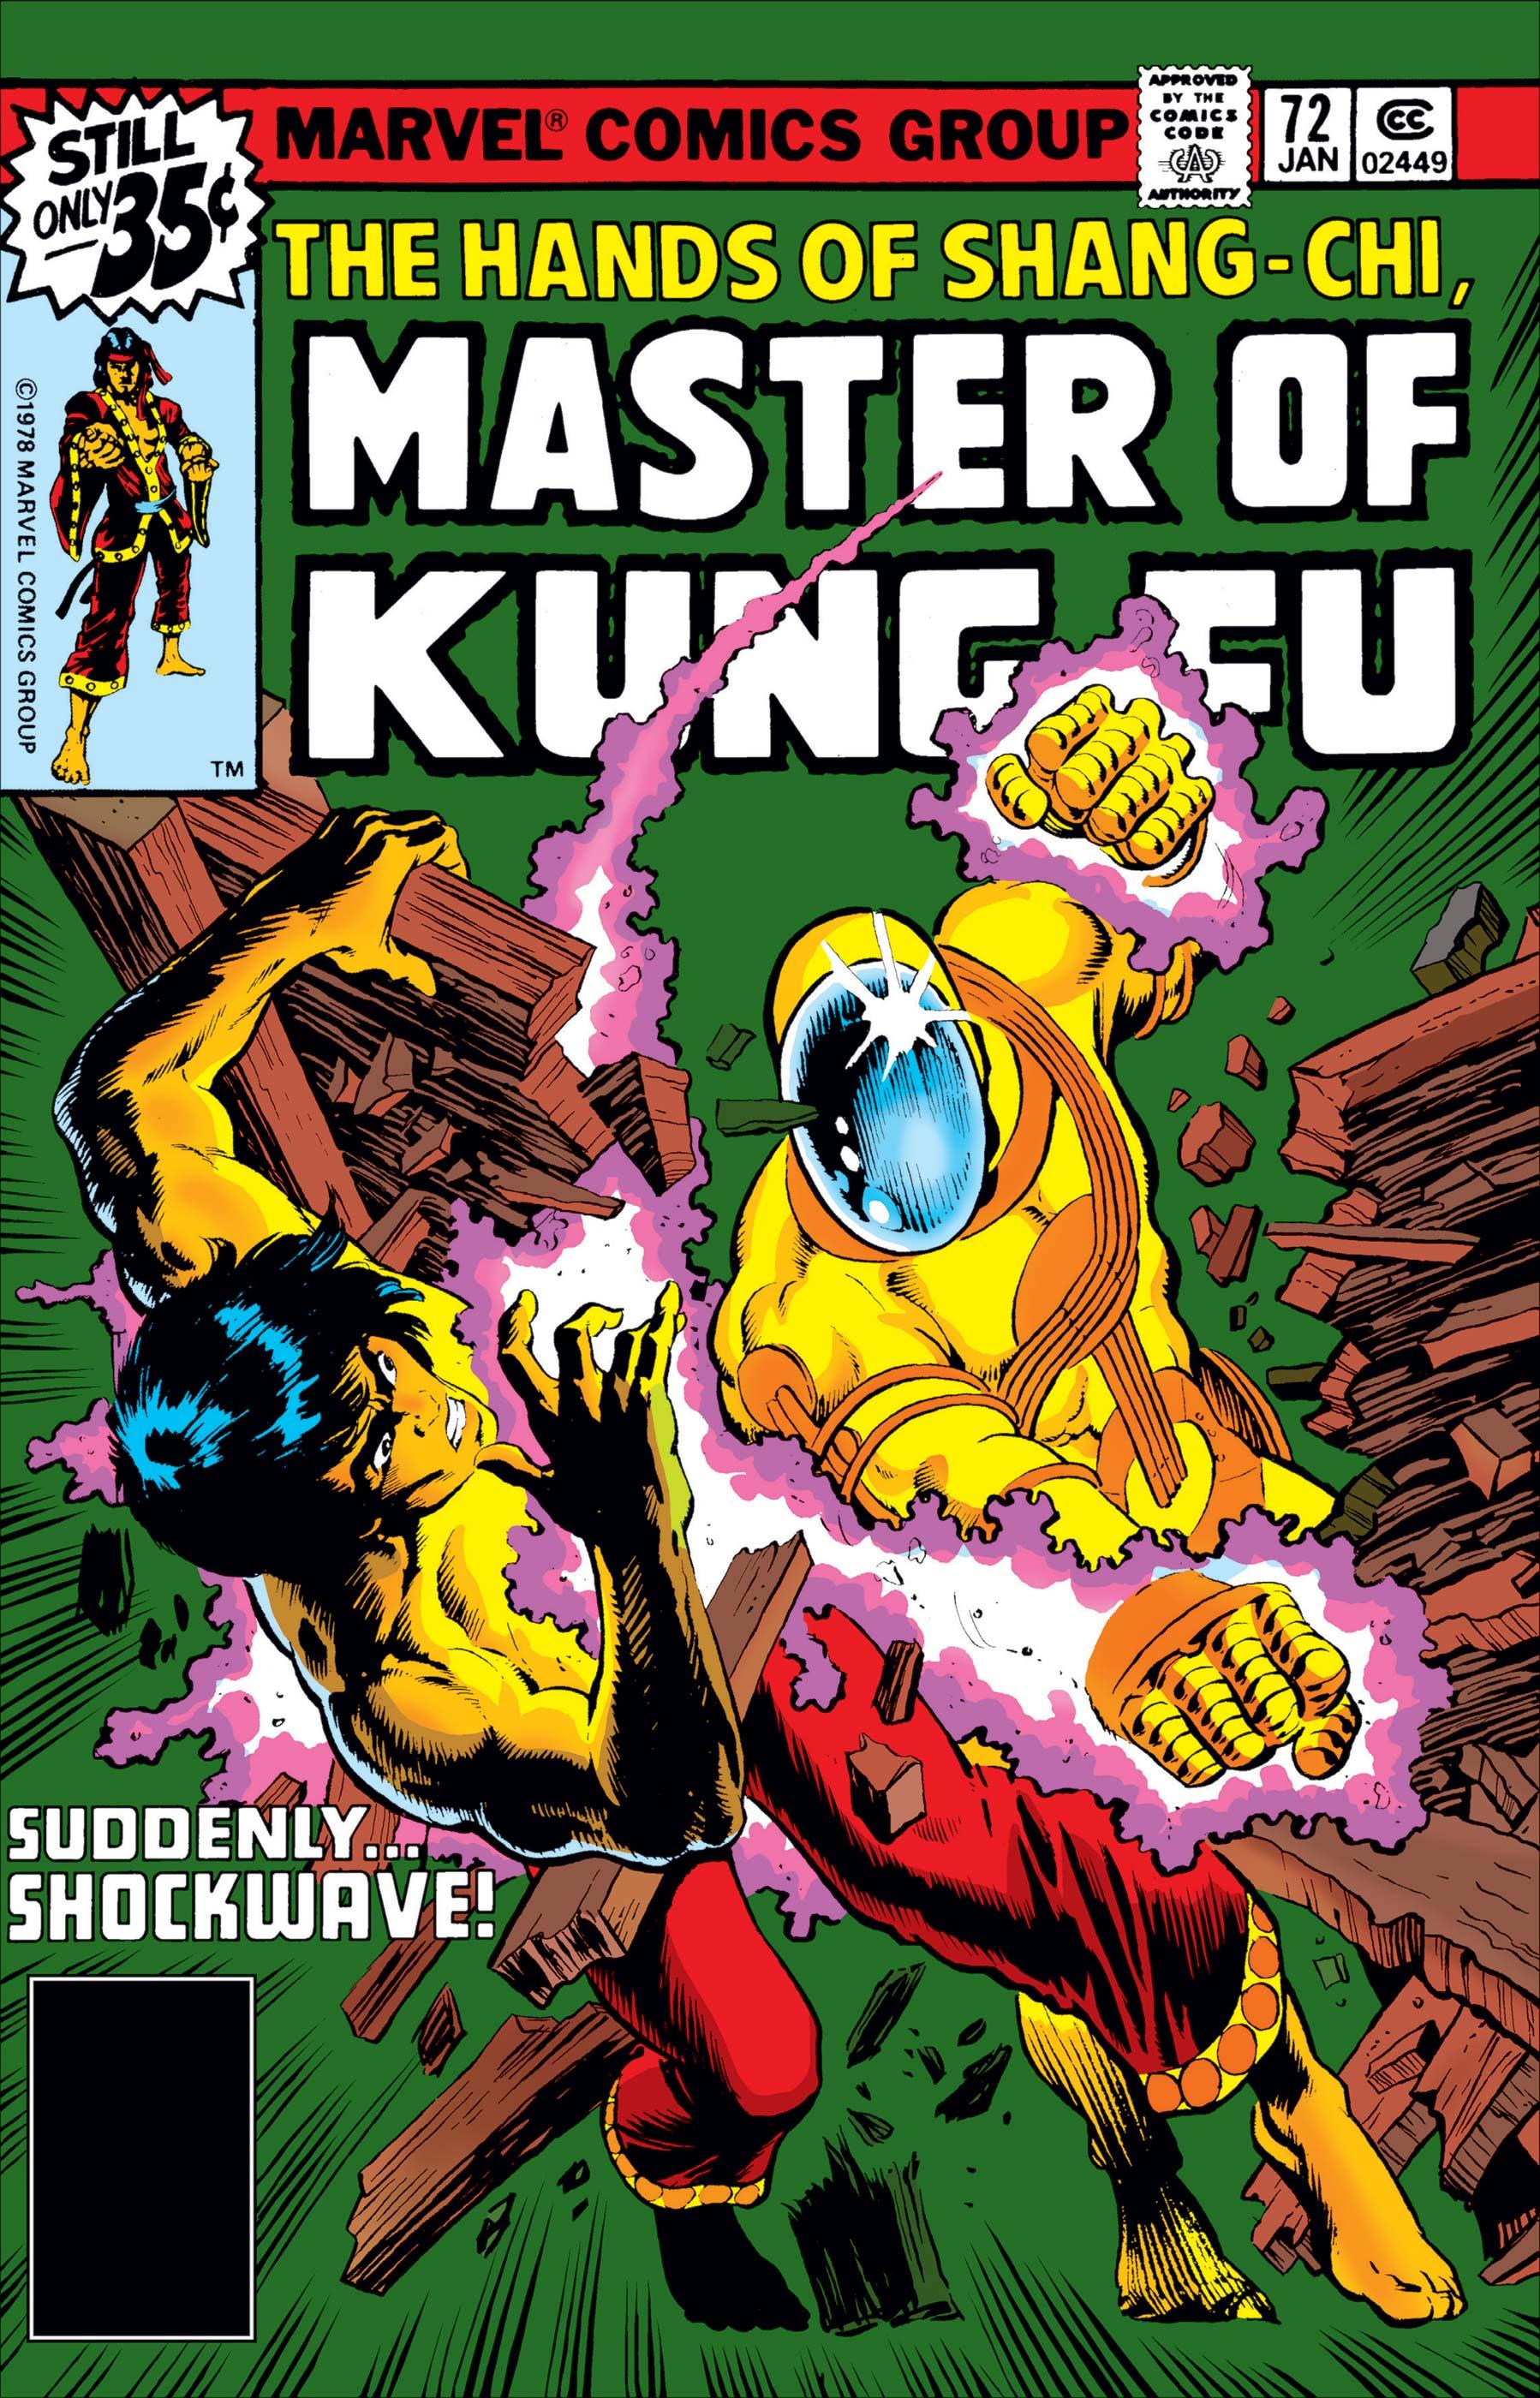 Master of Kung Fu (1974) #72